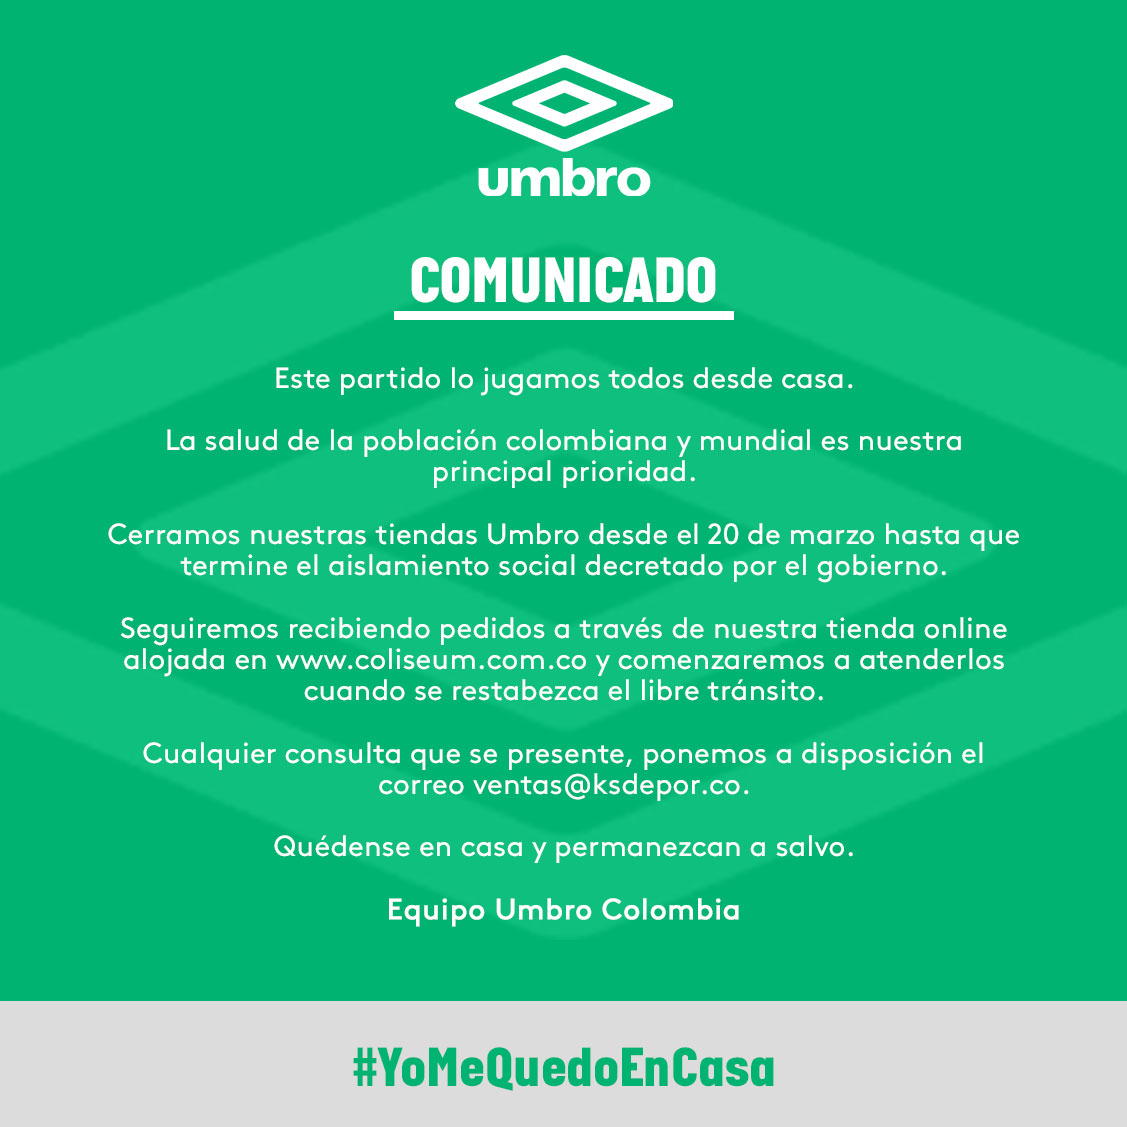 Este partido lo jugamos todos desde 🏠 #YoMeQuedoEnCasa https://t.co/1b5V7XG382